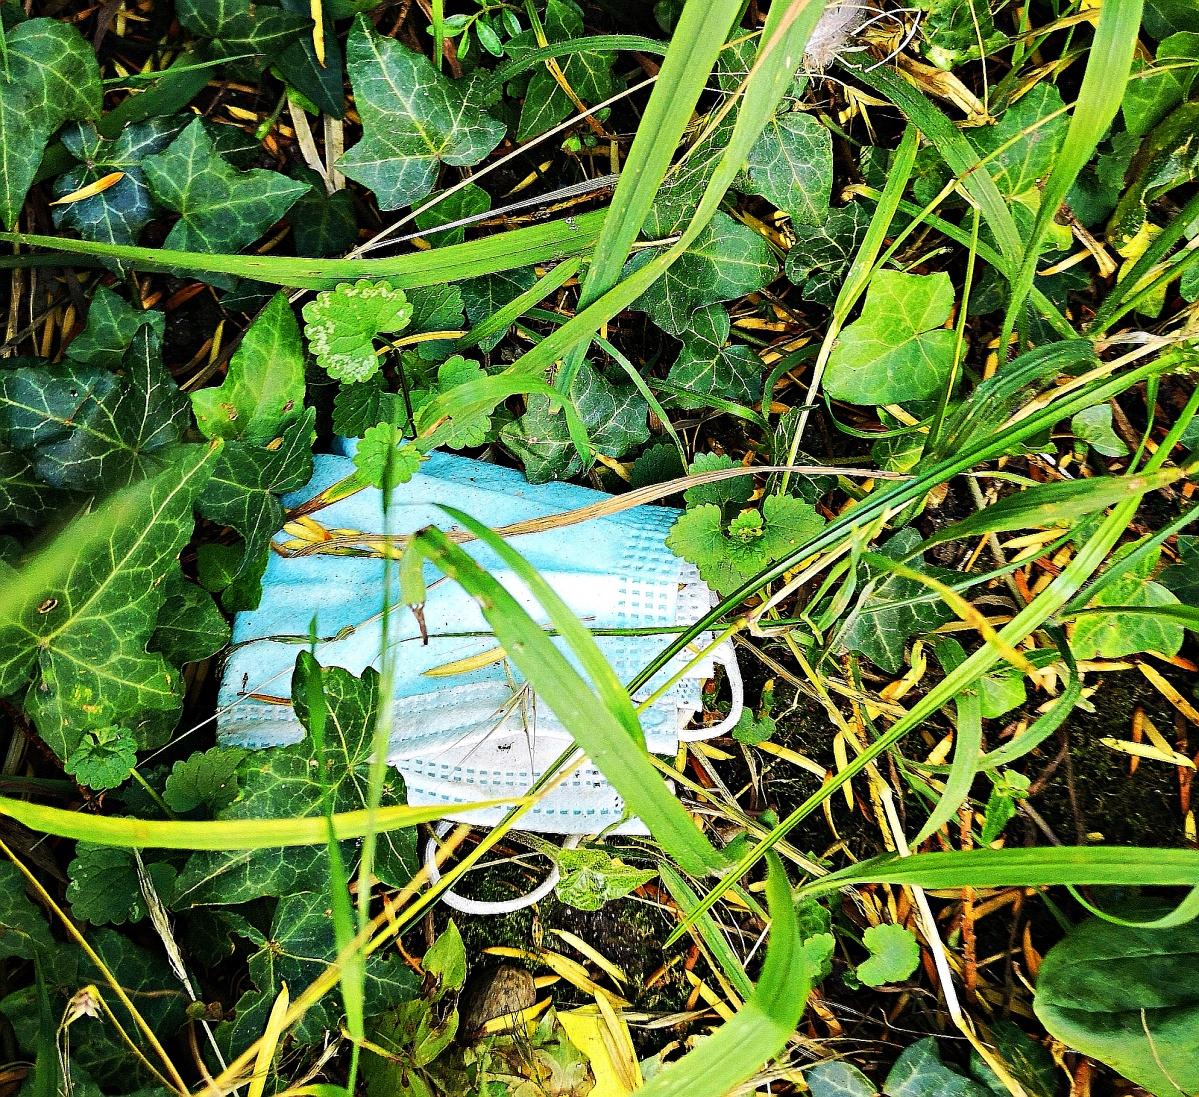 Corona hinterlässt Spuren in der Natur